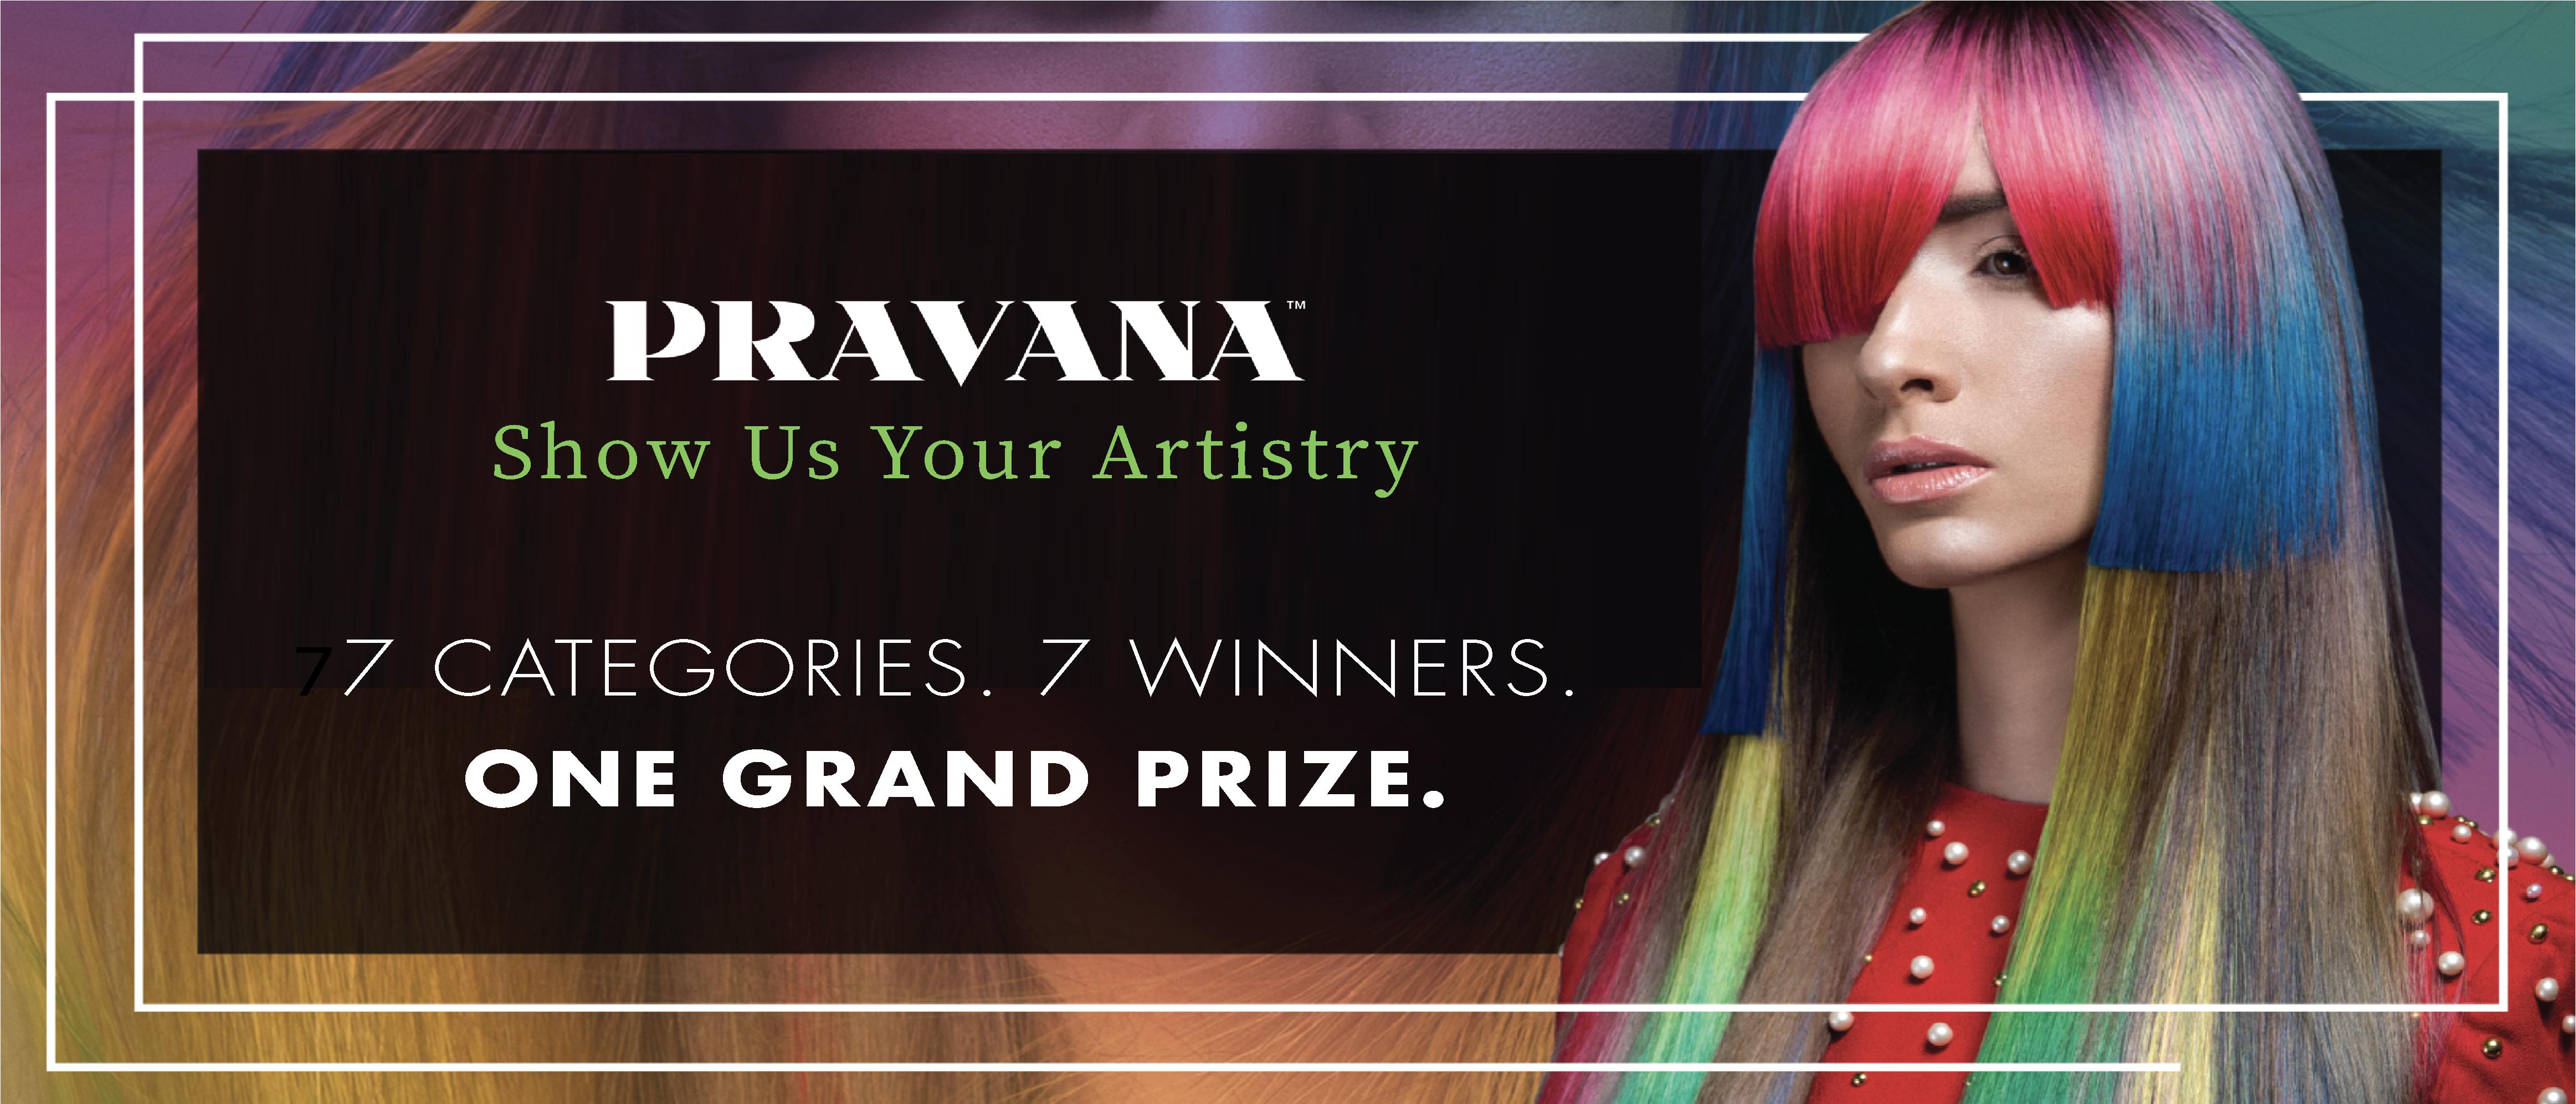 show-us-your-artistry-pravana.png